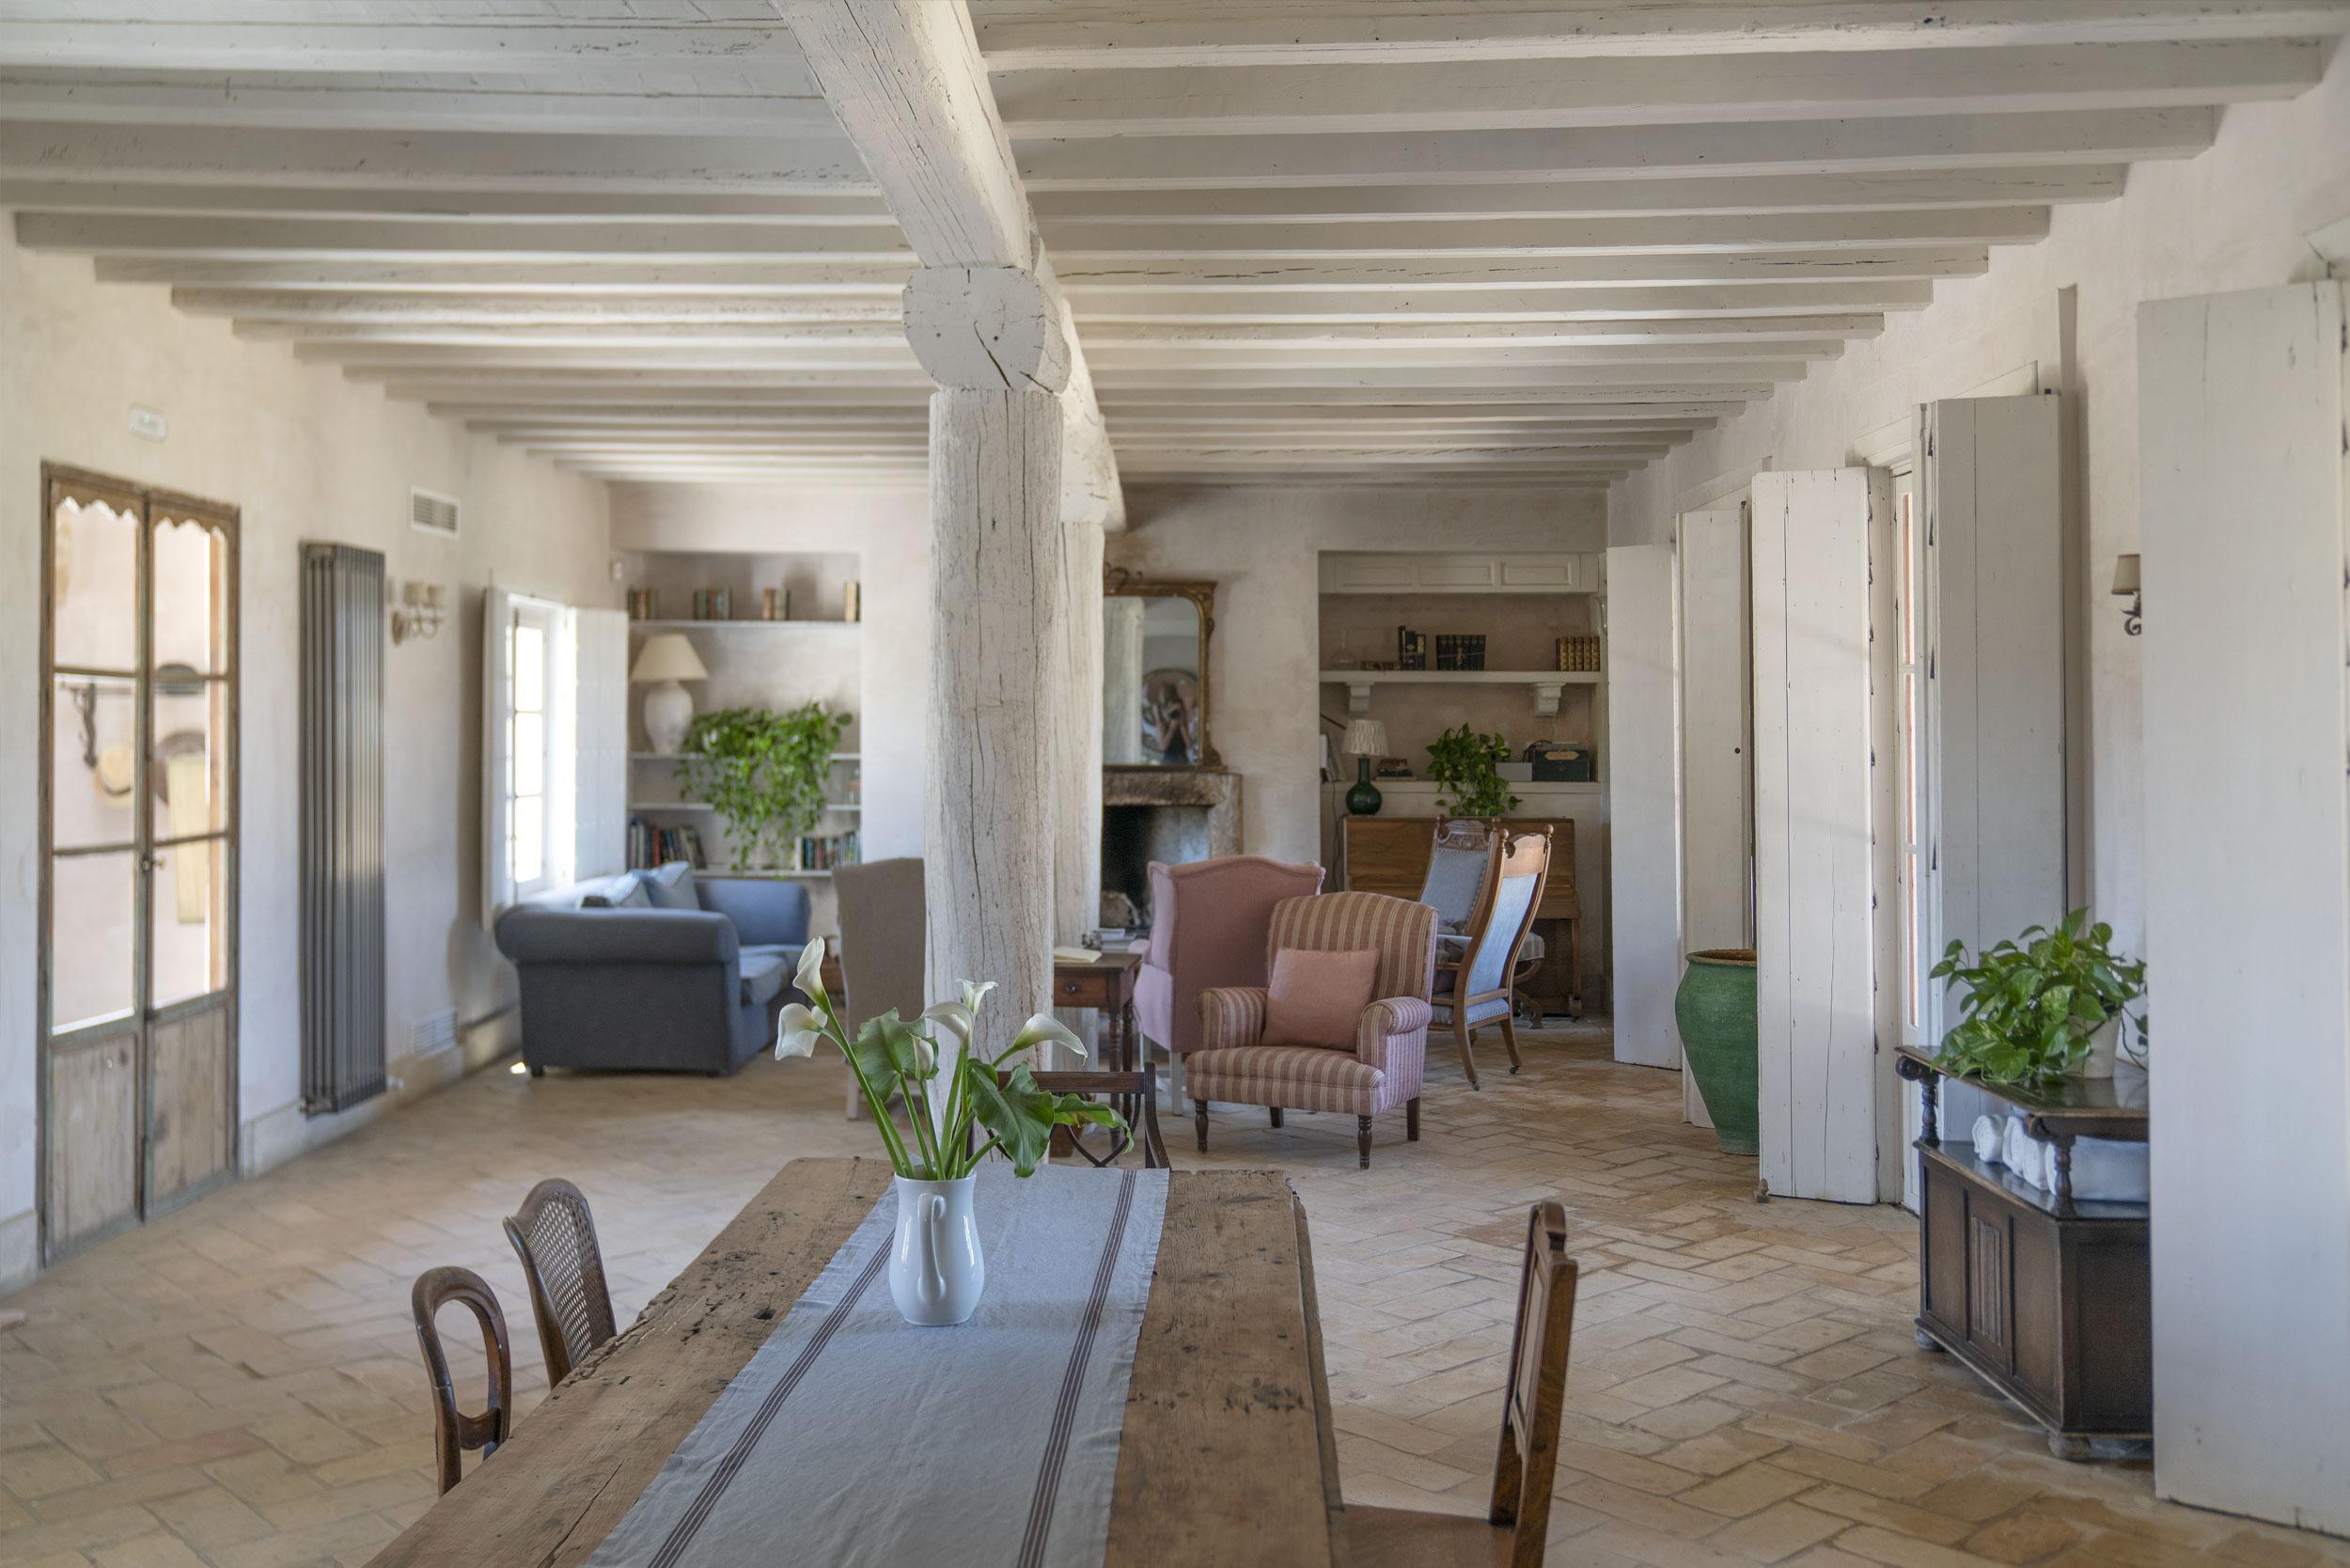 Casa-La-Siesta-Spain-Fiona-Burrage-Photography-reception.jpg